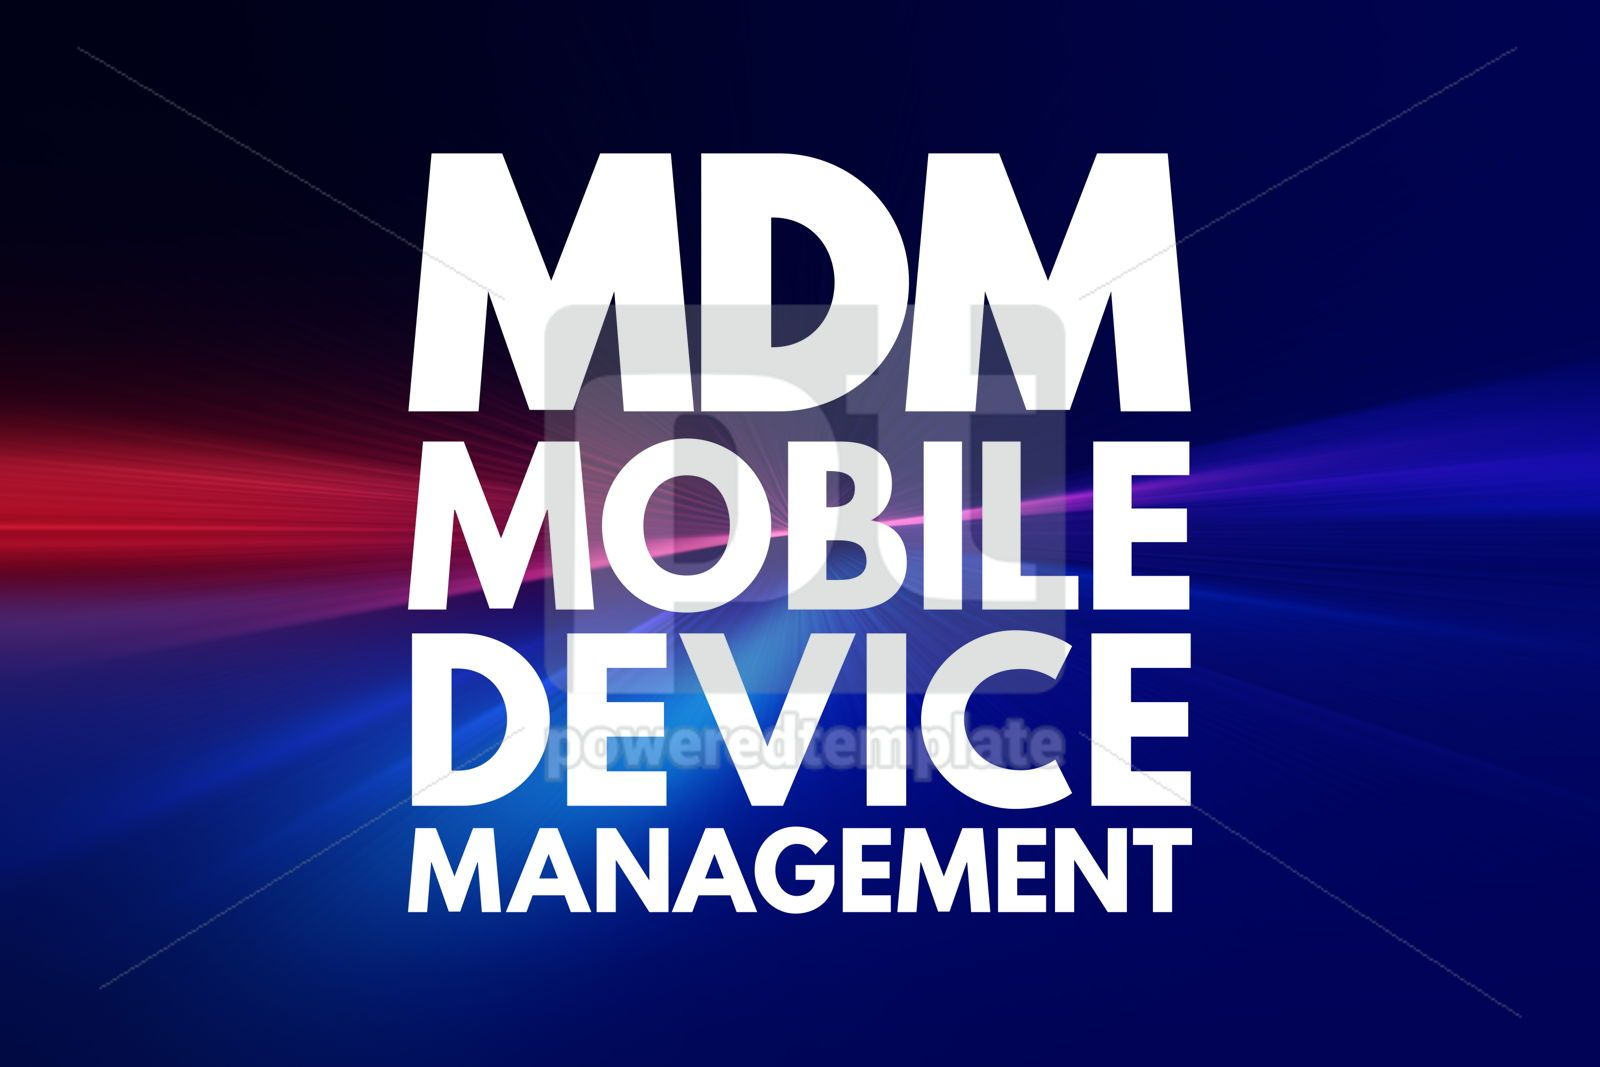 MDM - Mobile Device Management acronym technology concept backg, 16077, Business — PoweredTemplate.com